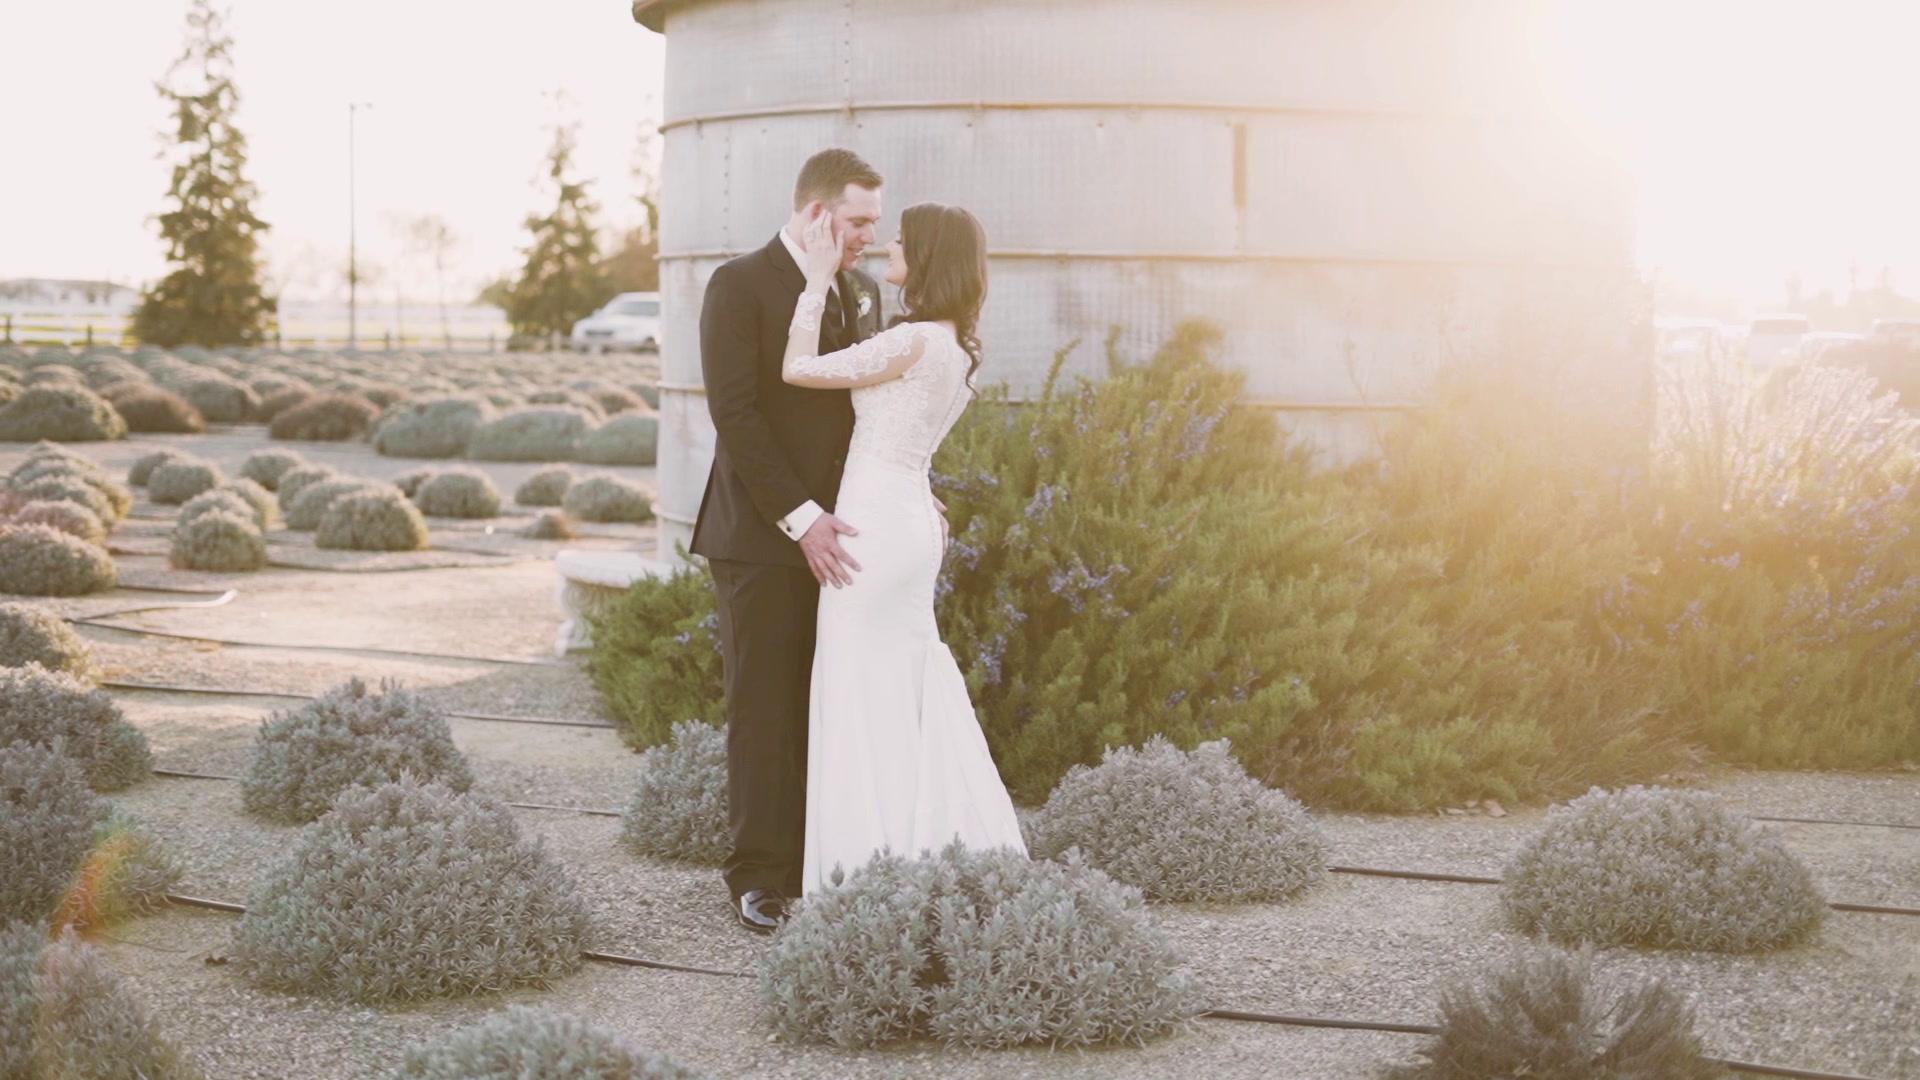 Zach  + Katelynn | Turlock, California | Pageo Lavender Farm